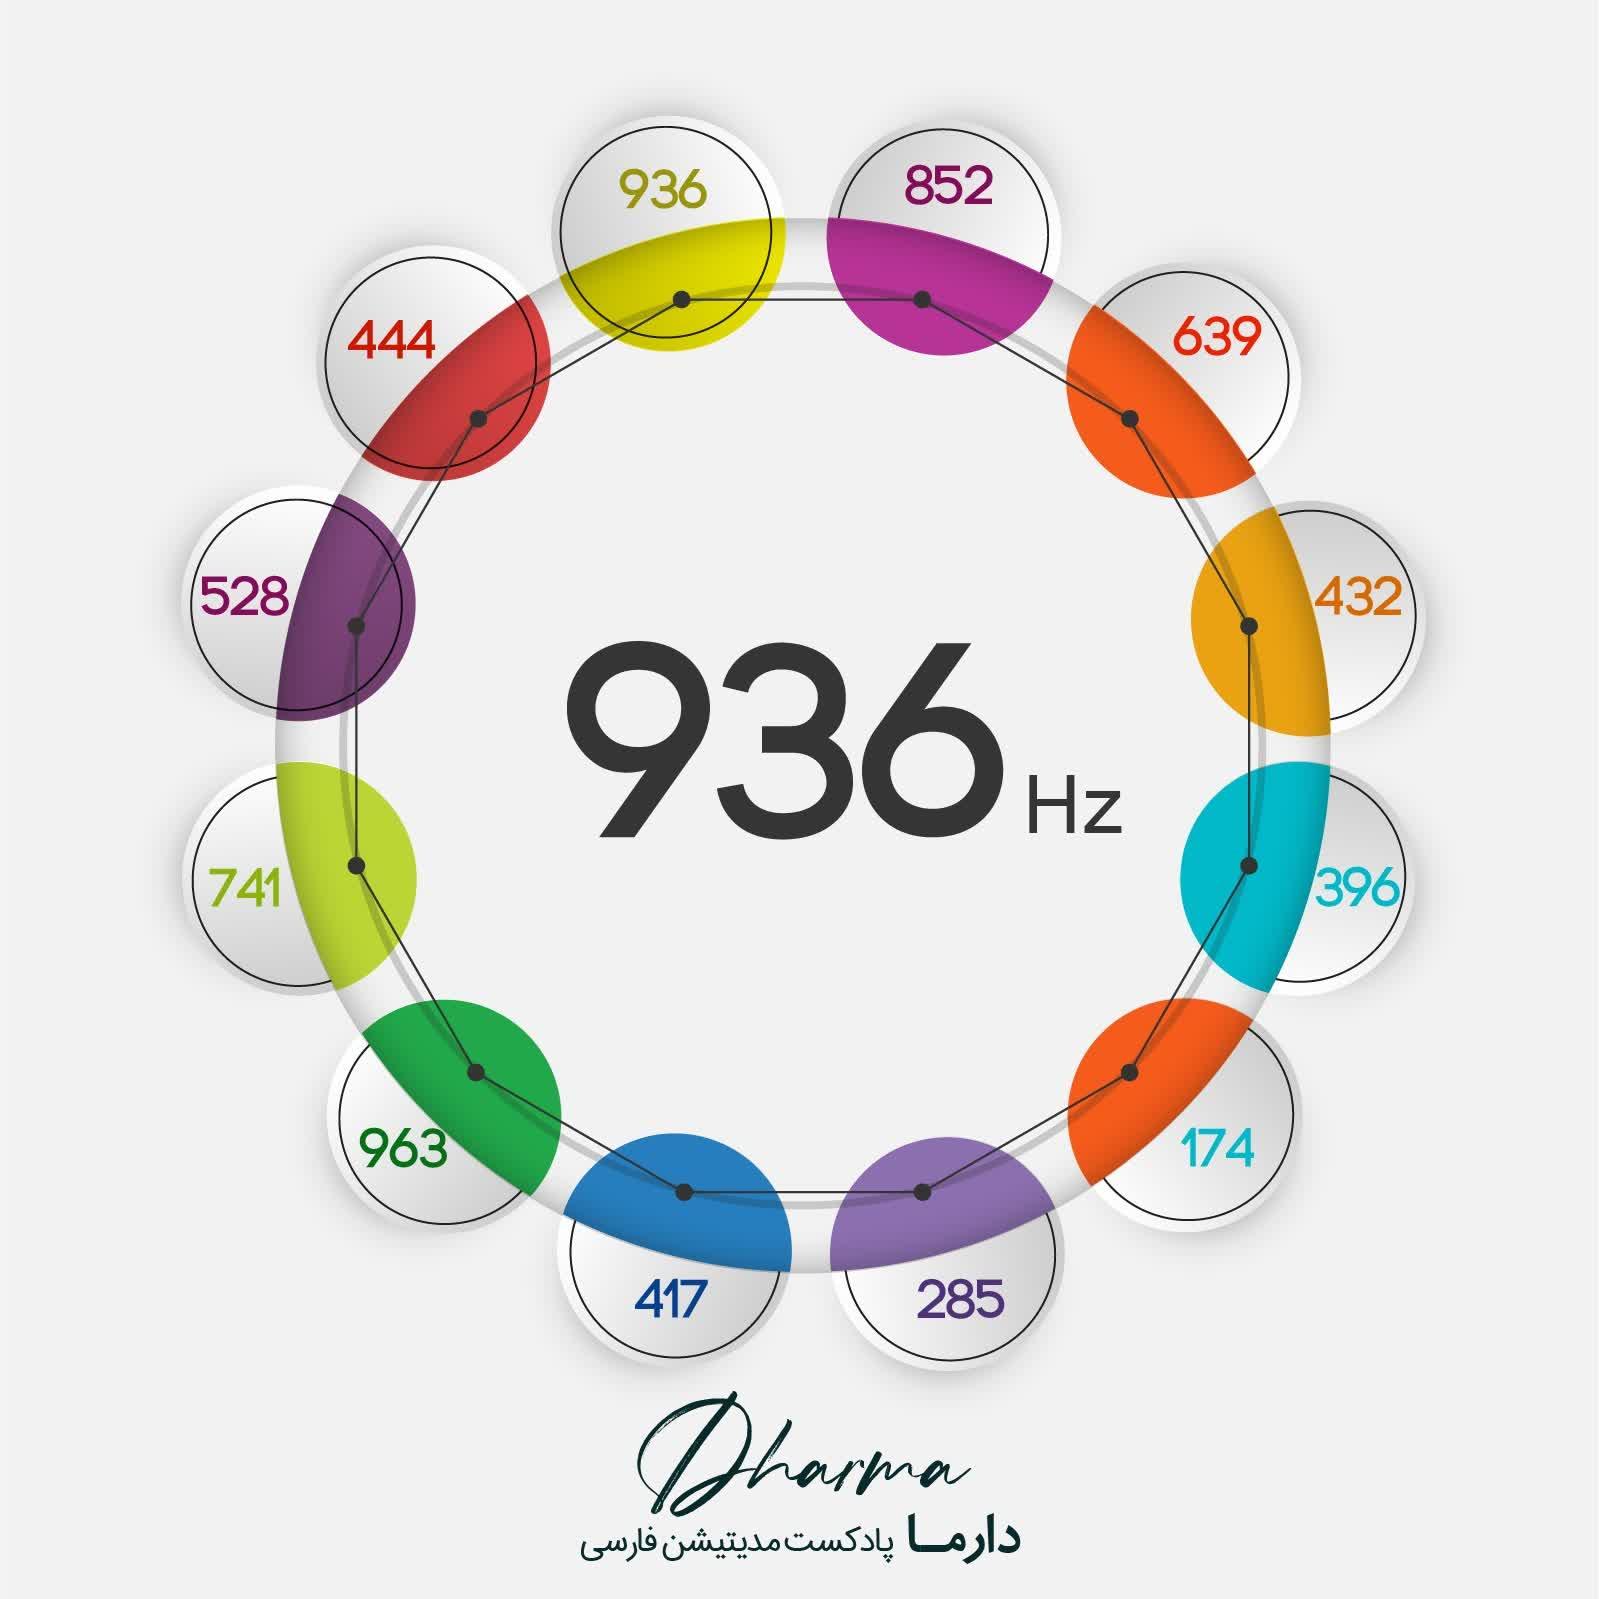 936Hz - فرکانس 936 هرتز